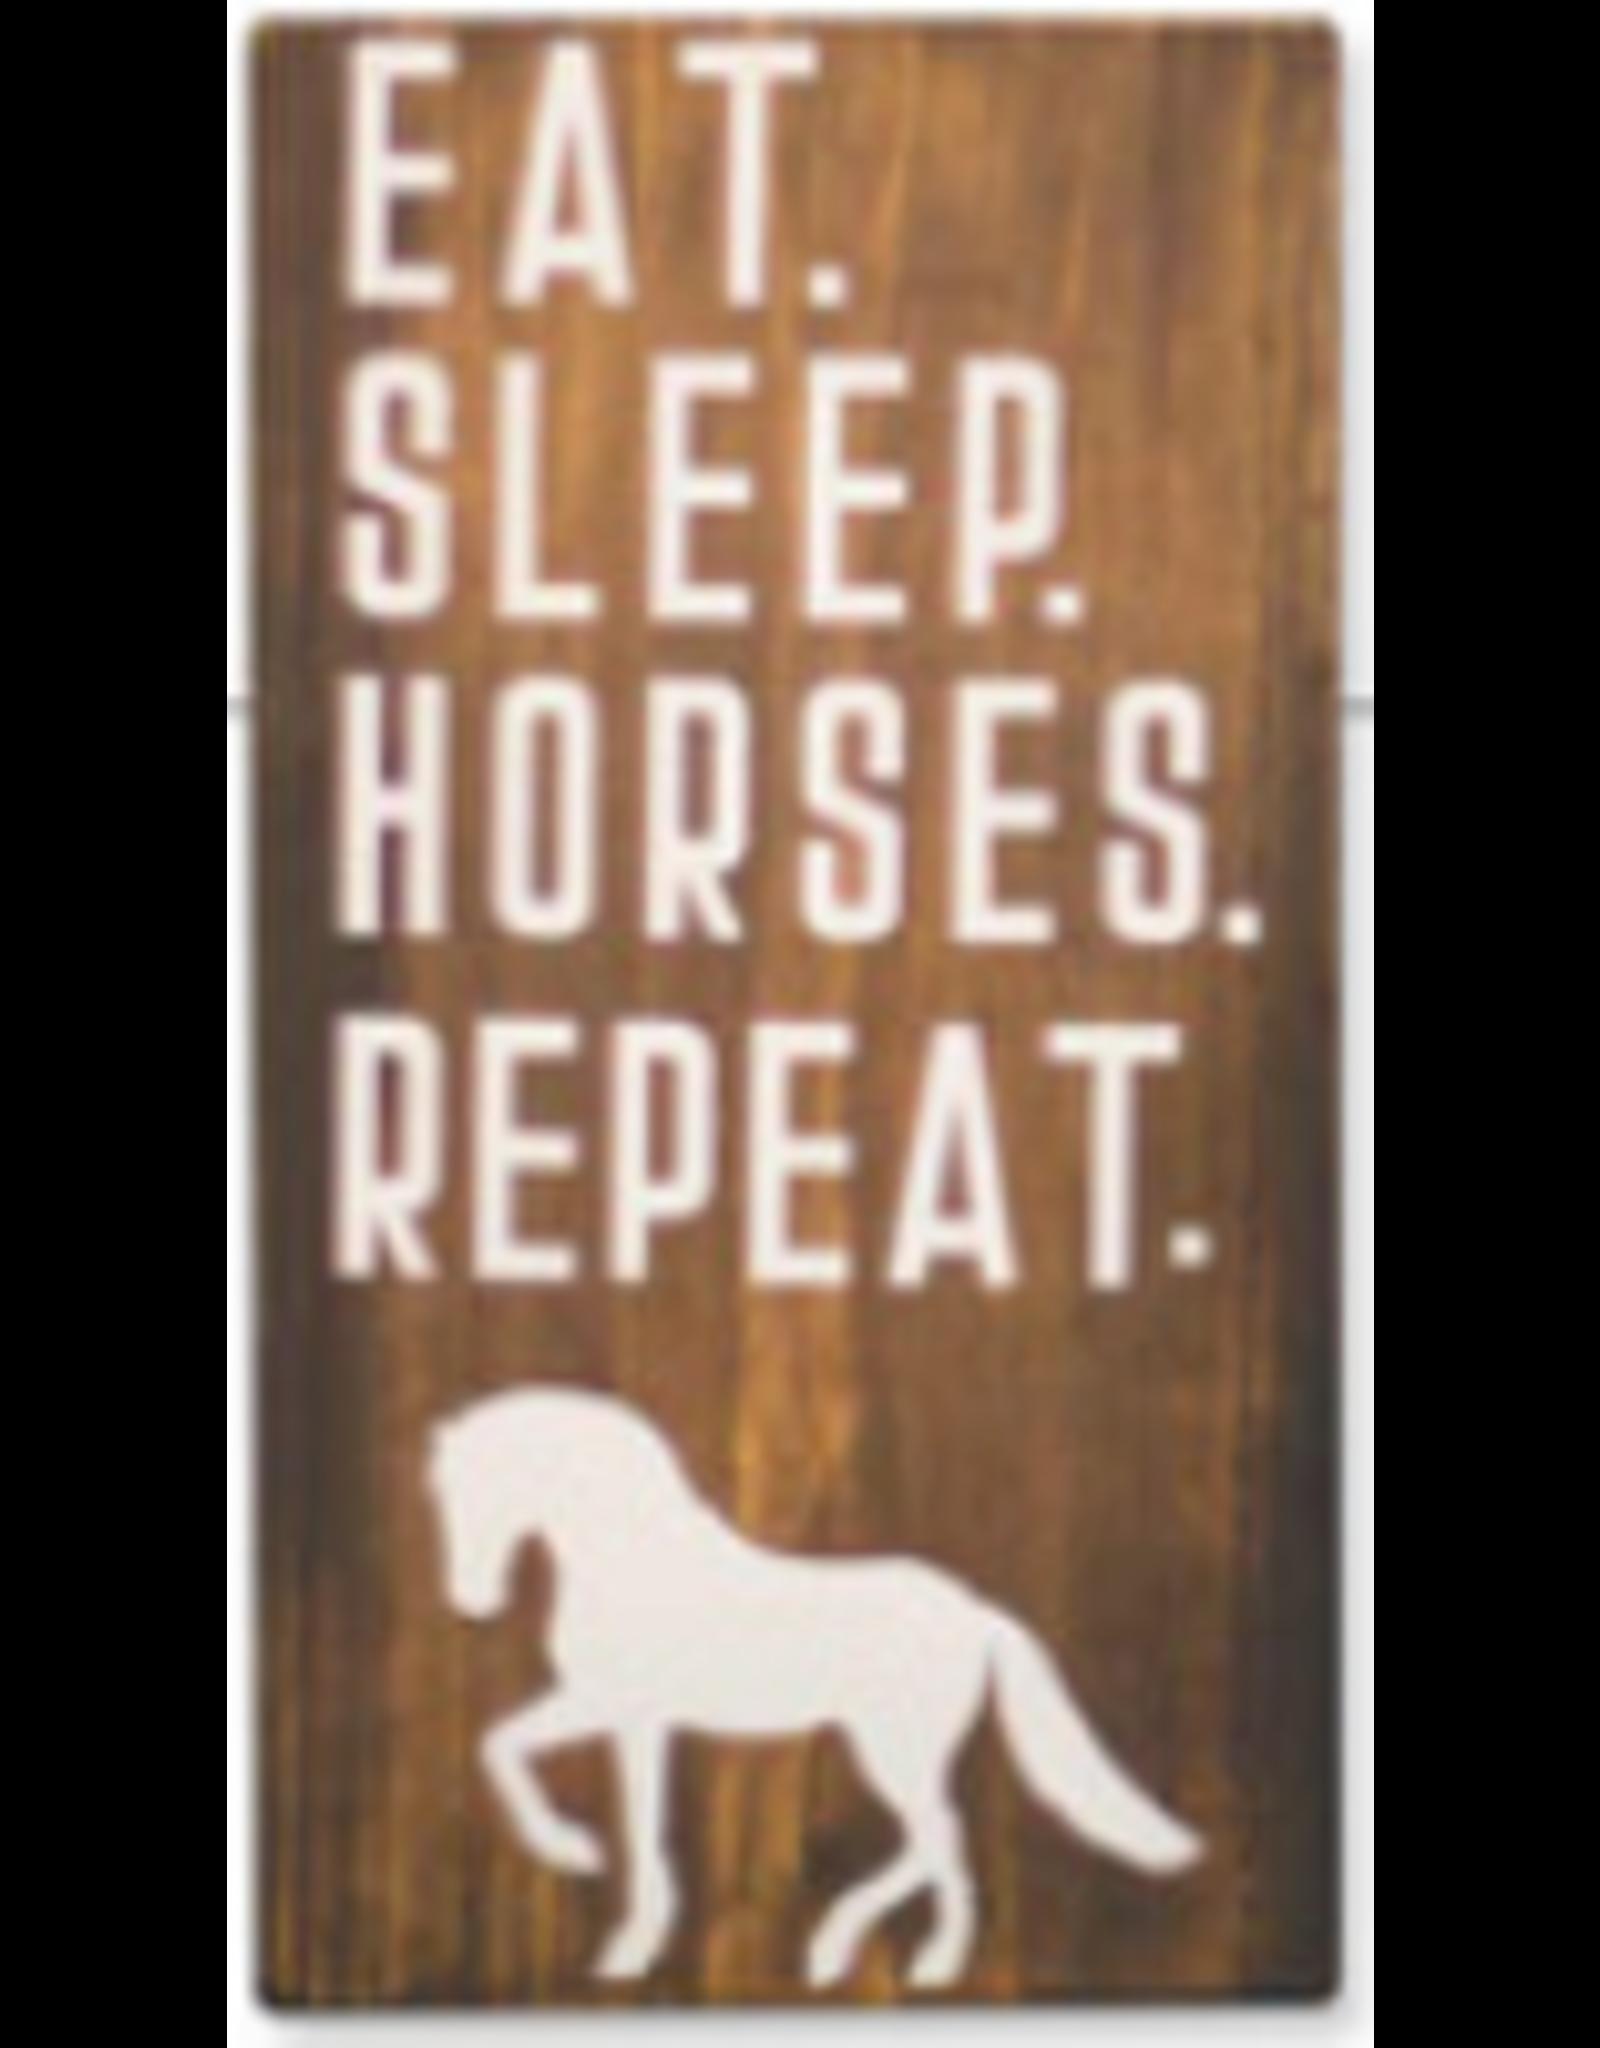 Shelf Sitter, Eat. Sleep. Horses. Repeat.